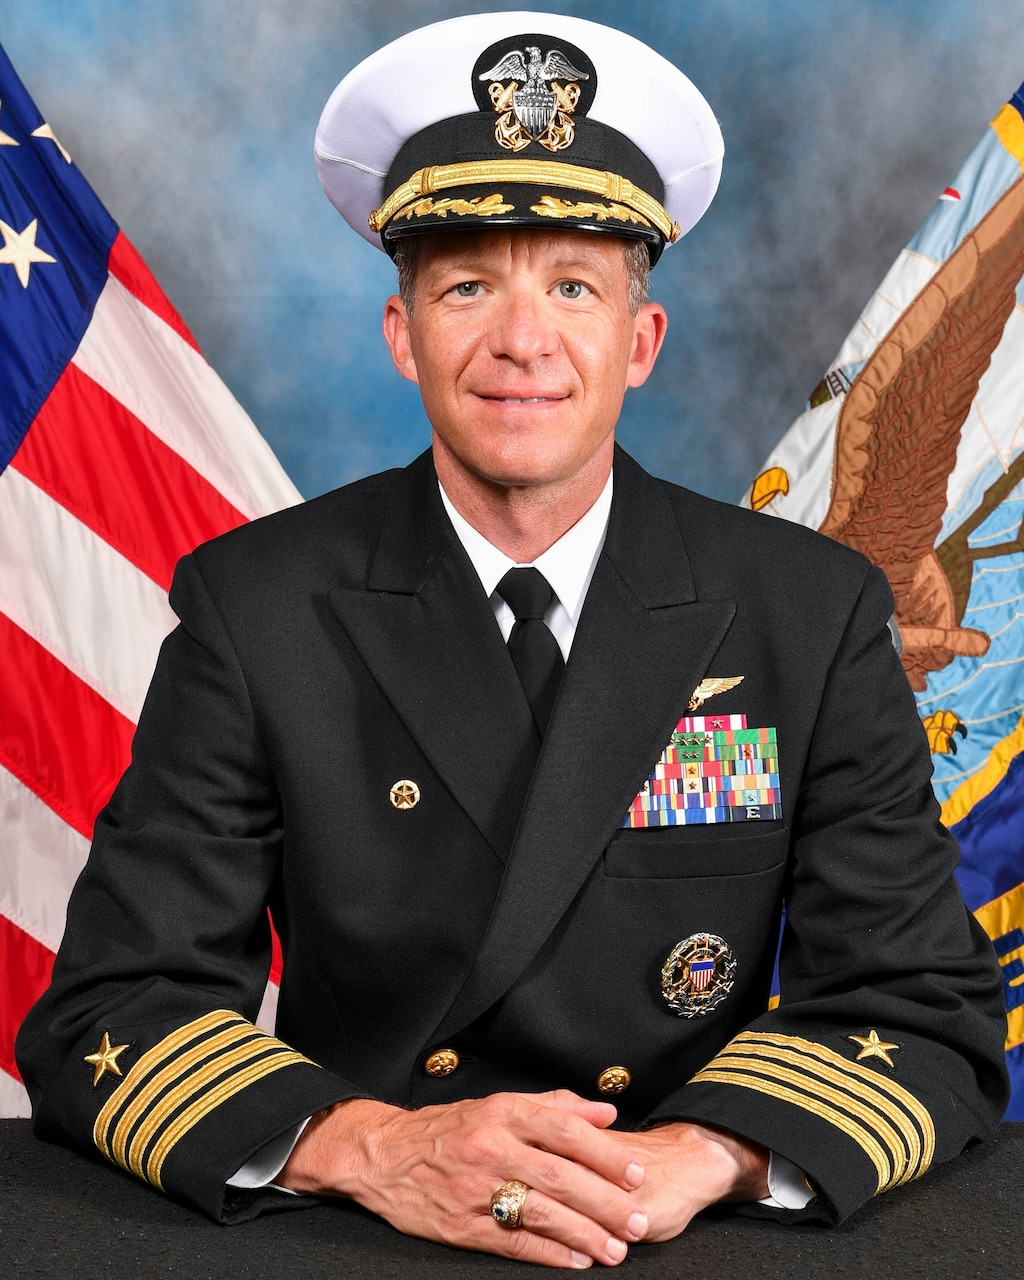 Captain Matthew C. Thomas